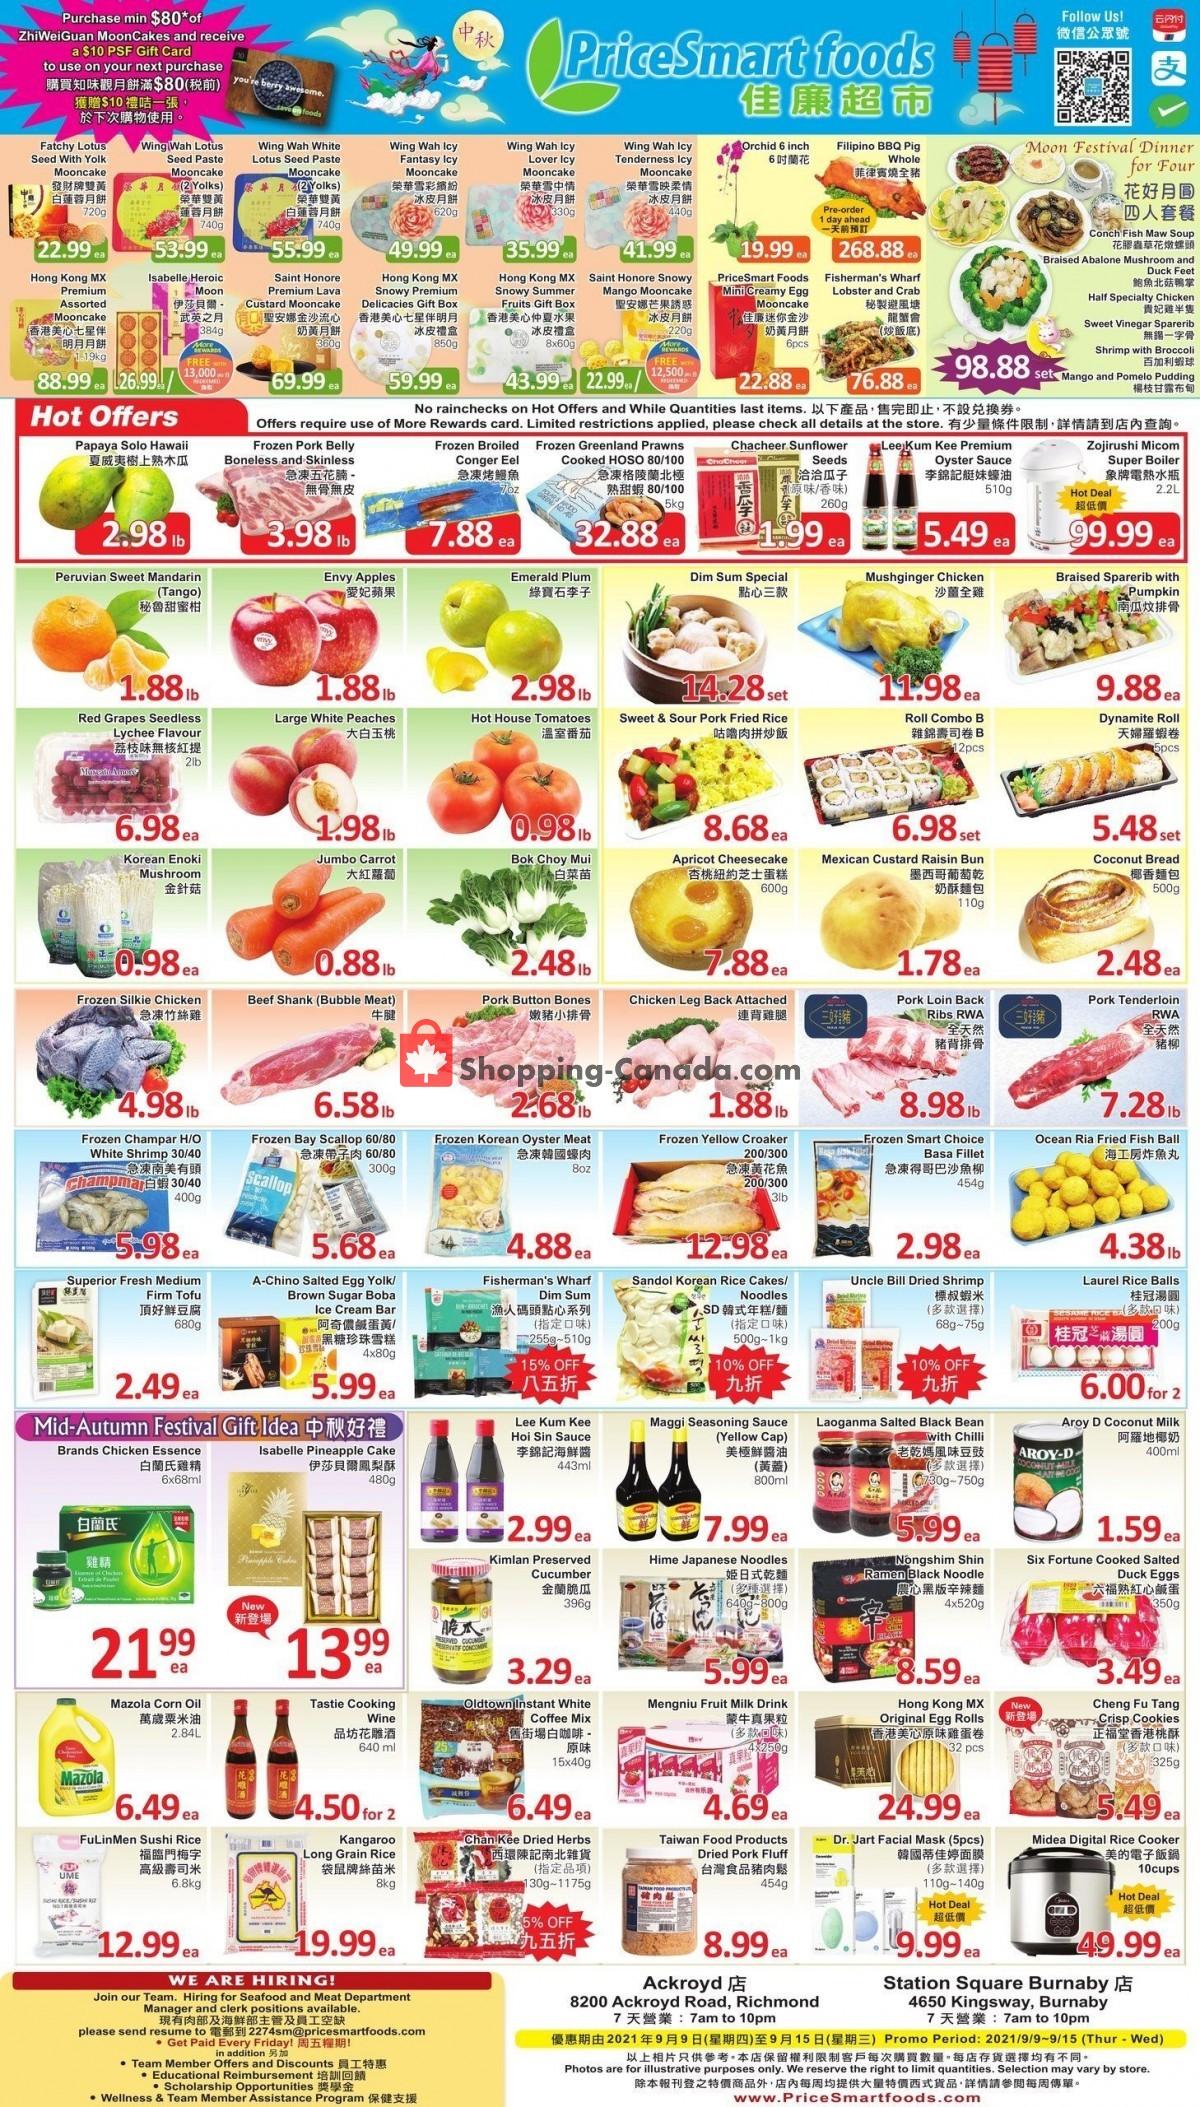 Flyer PriceSmart Foods Canada - from Thursday September 9, 2021 to Wednesday September 15, 2021